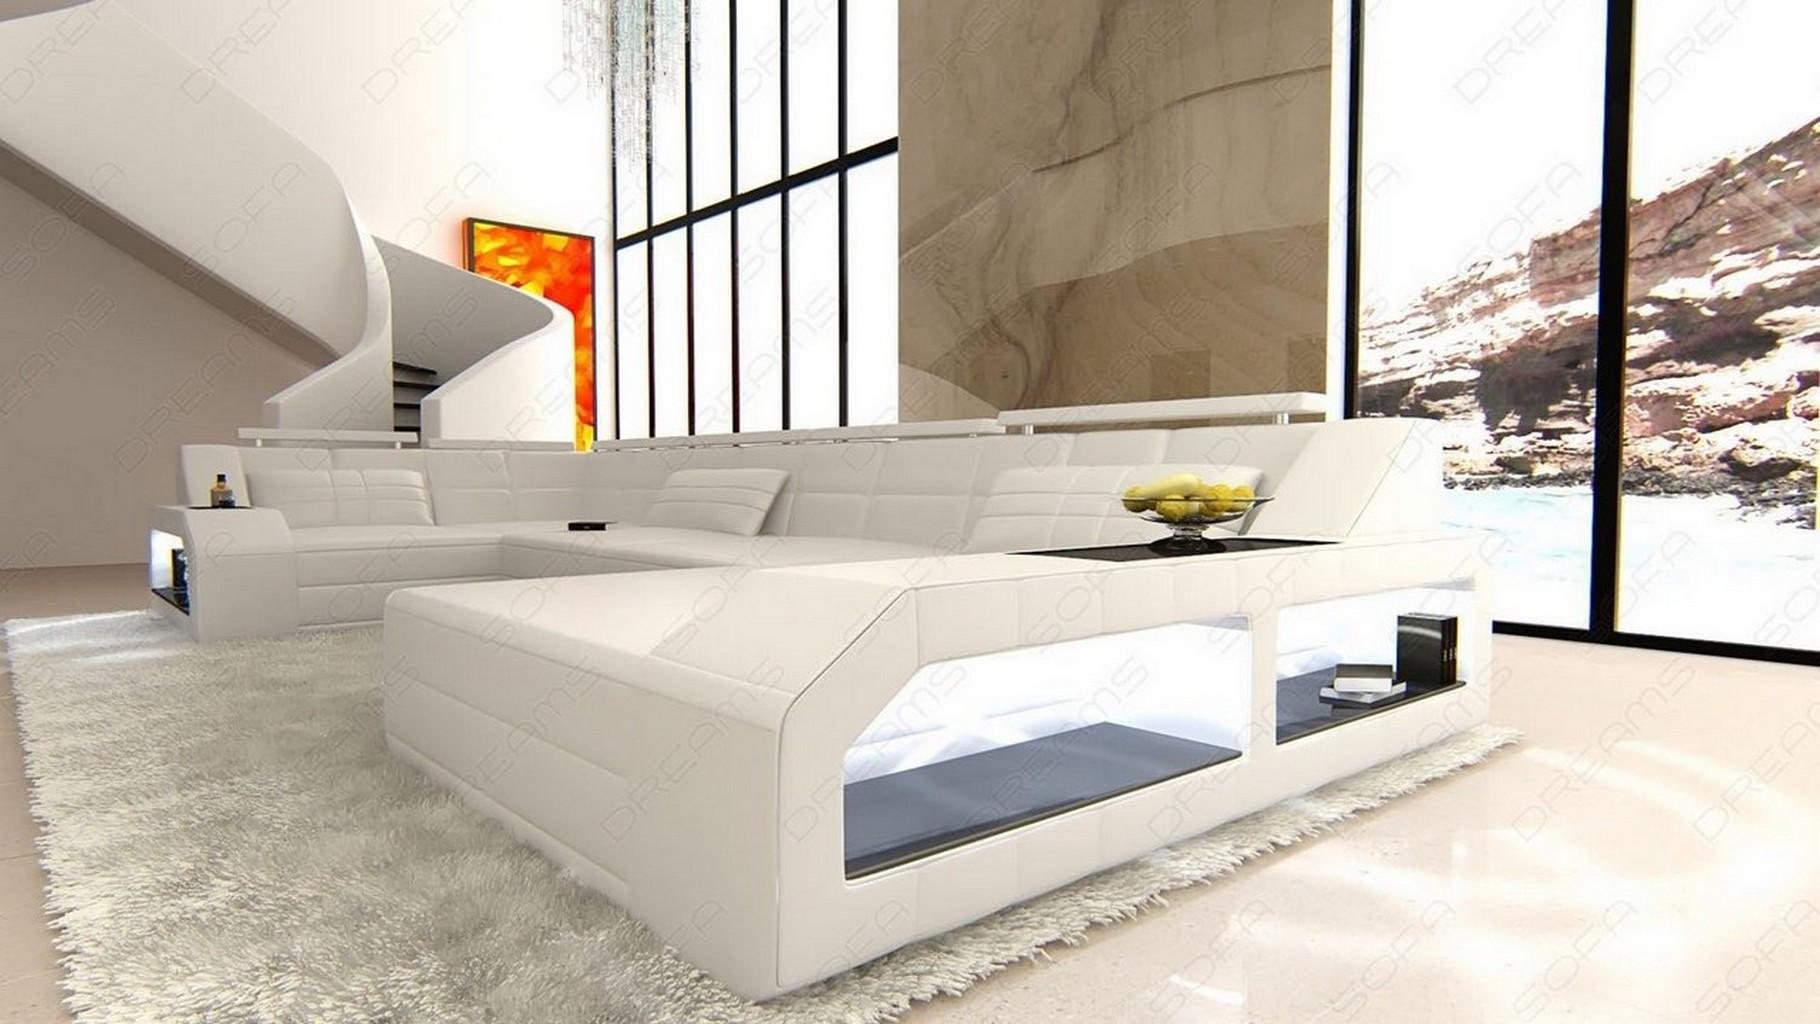 AREZZO Designer Seating Ensemble Sofa Corner Couch with Ilumination ...